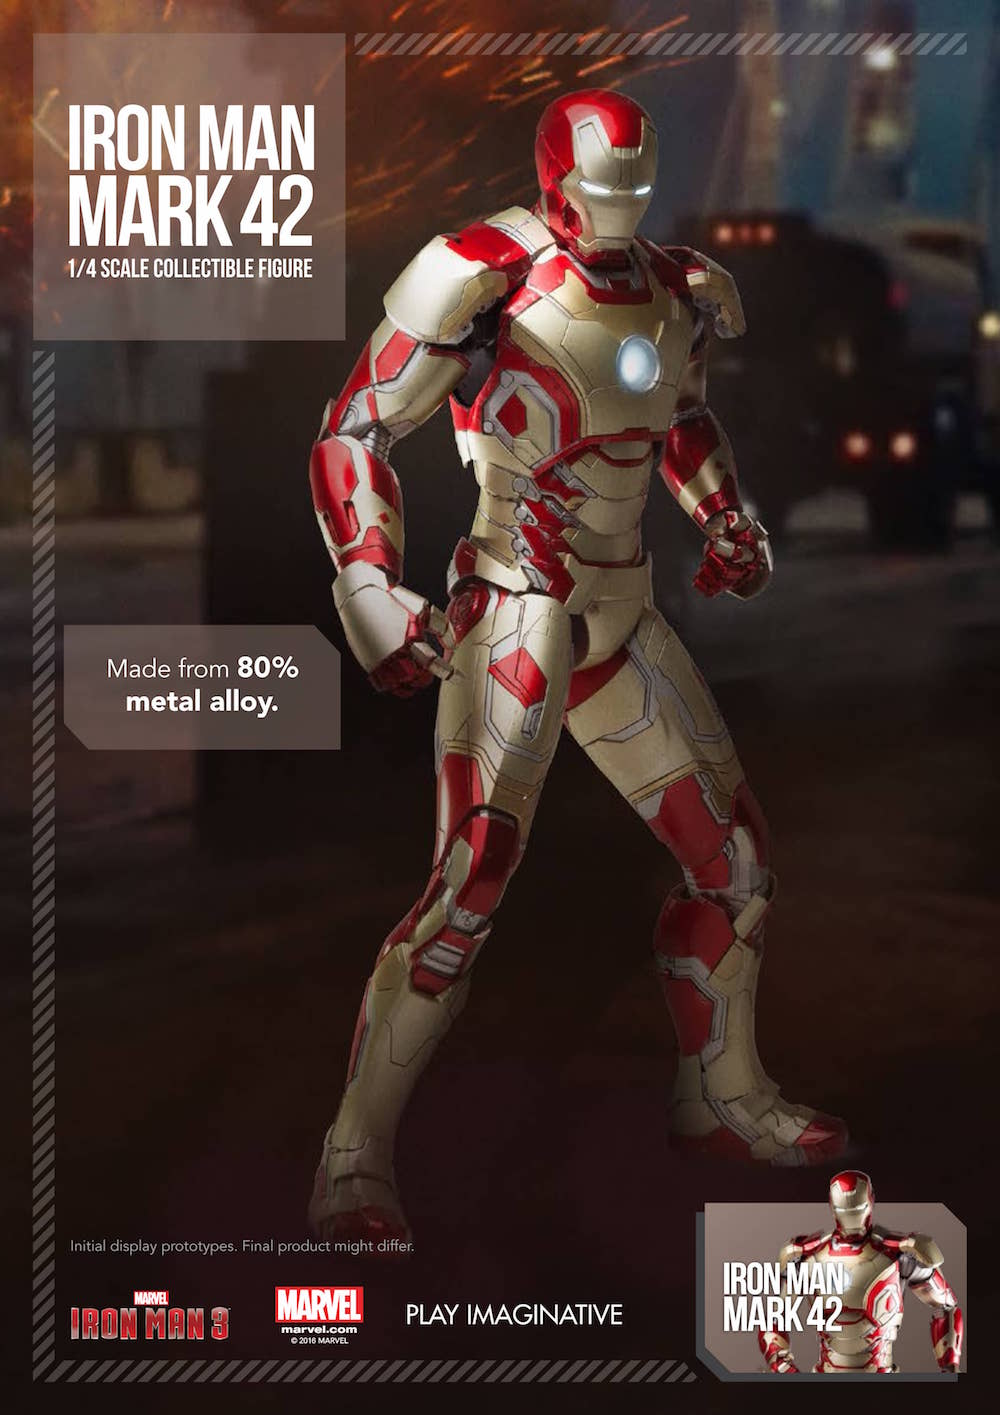 IRON MAN MK42 FIGURA METAL 45 CM MARVEL IRON MAN 1/4 SCALE COLLECTIBLE FIGURE